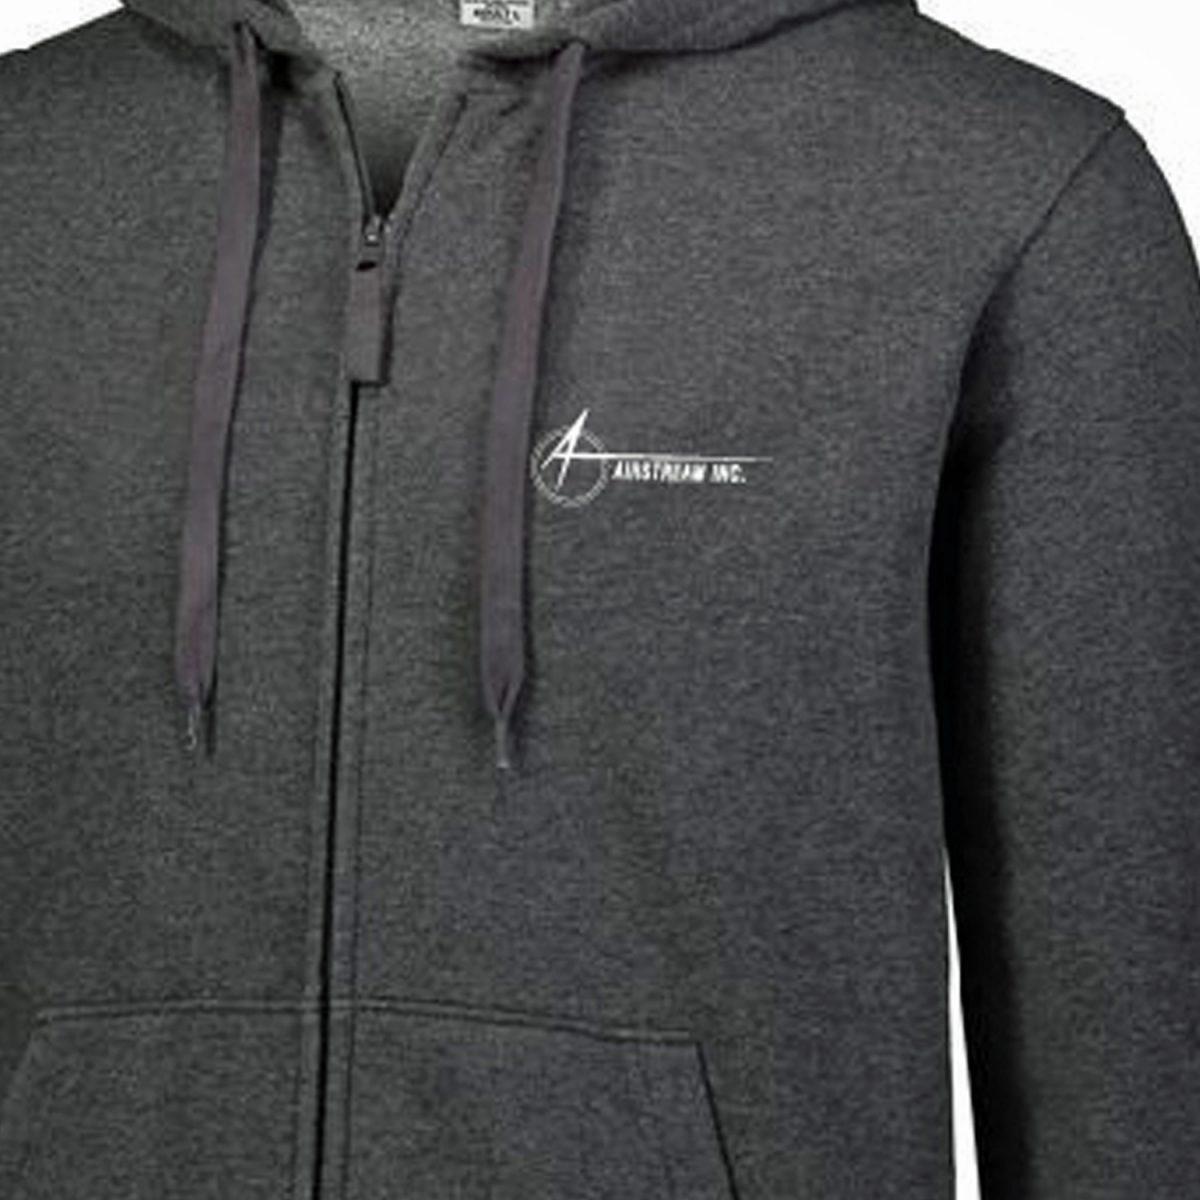 augusta zip hoodie close up